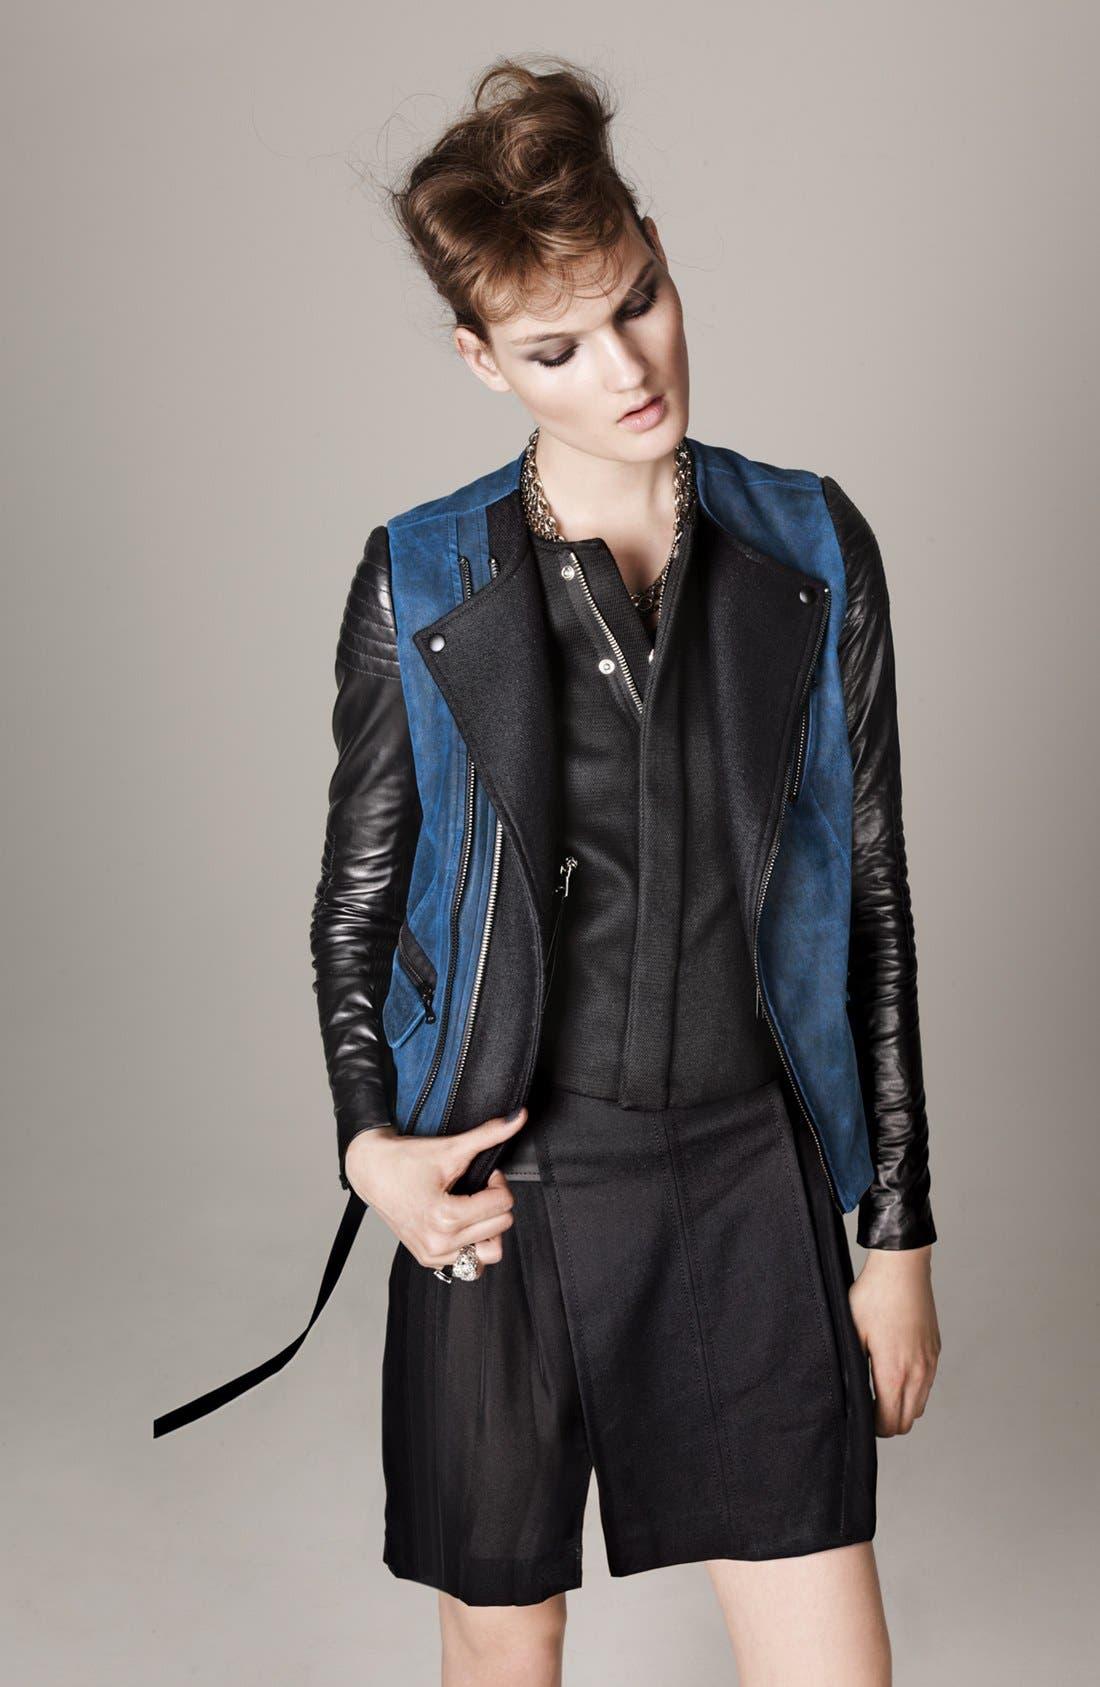 Main Image - Rebecca Taylor Vest, Moto Jacket & Skirt